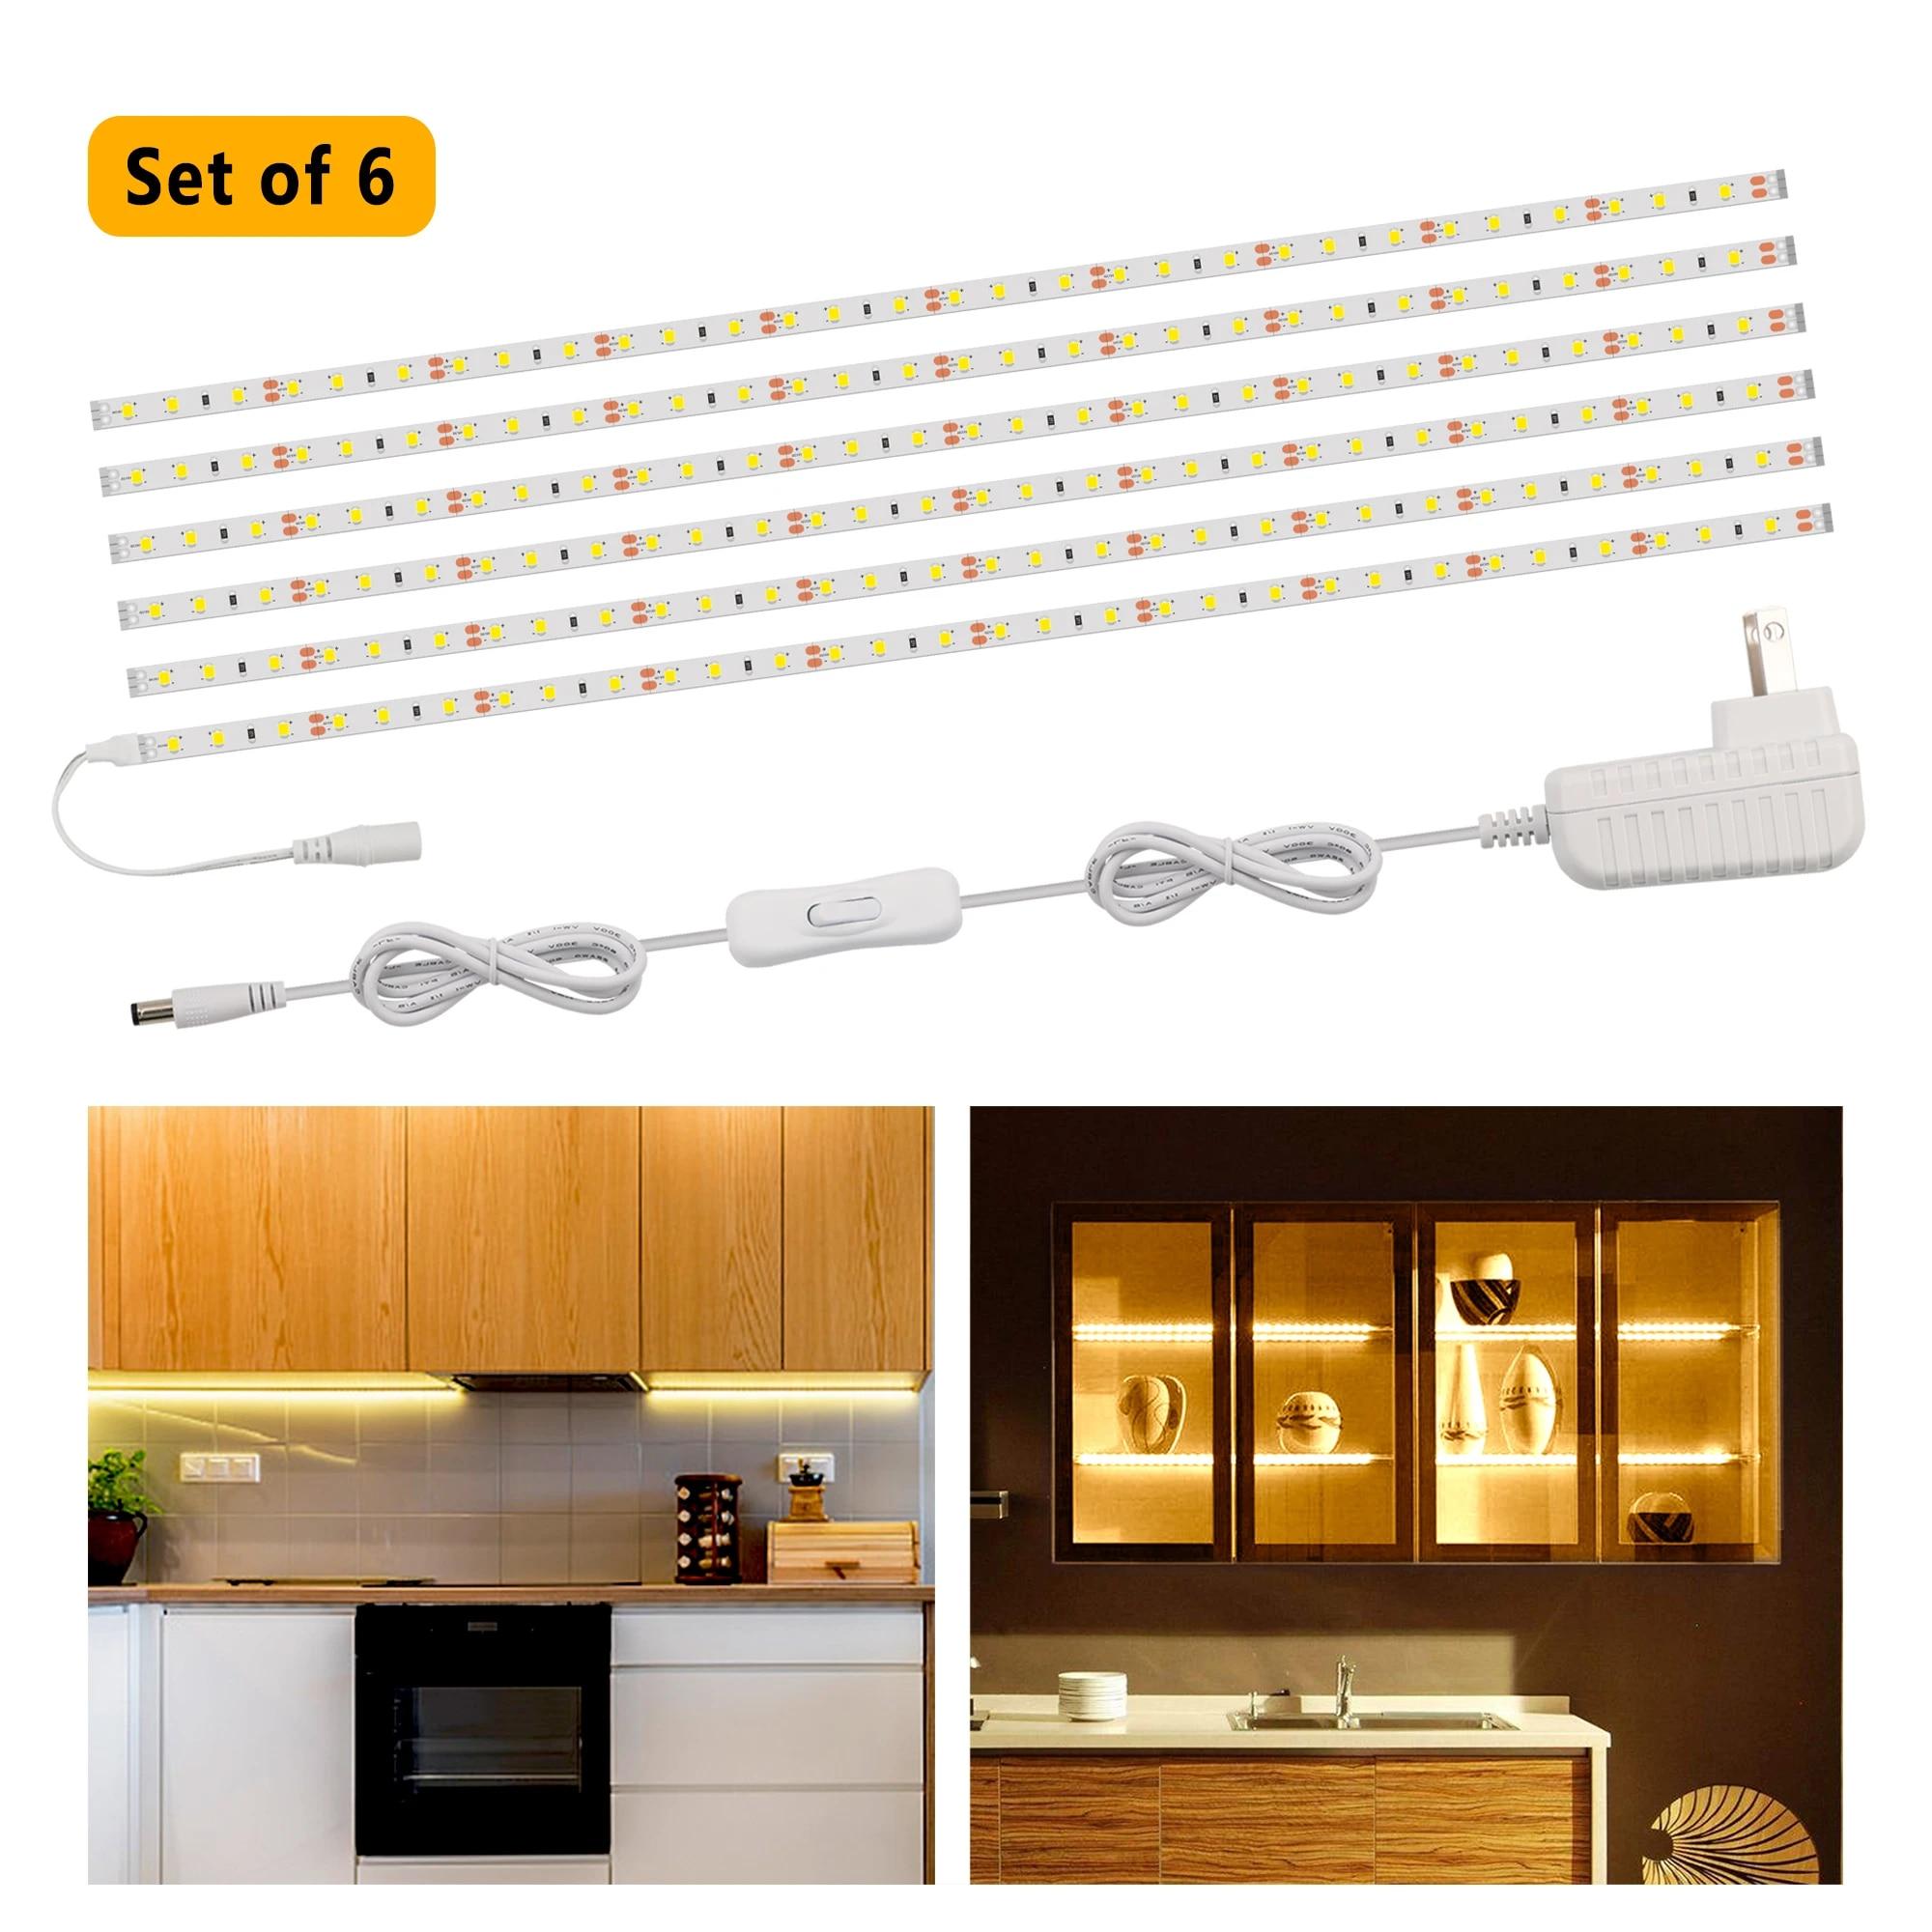 6pack Led Strip Lights 1200lm Under Cabinet Lighting Kit Flexible Stripe Lamp Led Tape Light Set For Kitchen Cabinets Bookcase Led Strips Aliexpress